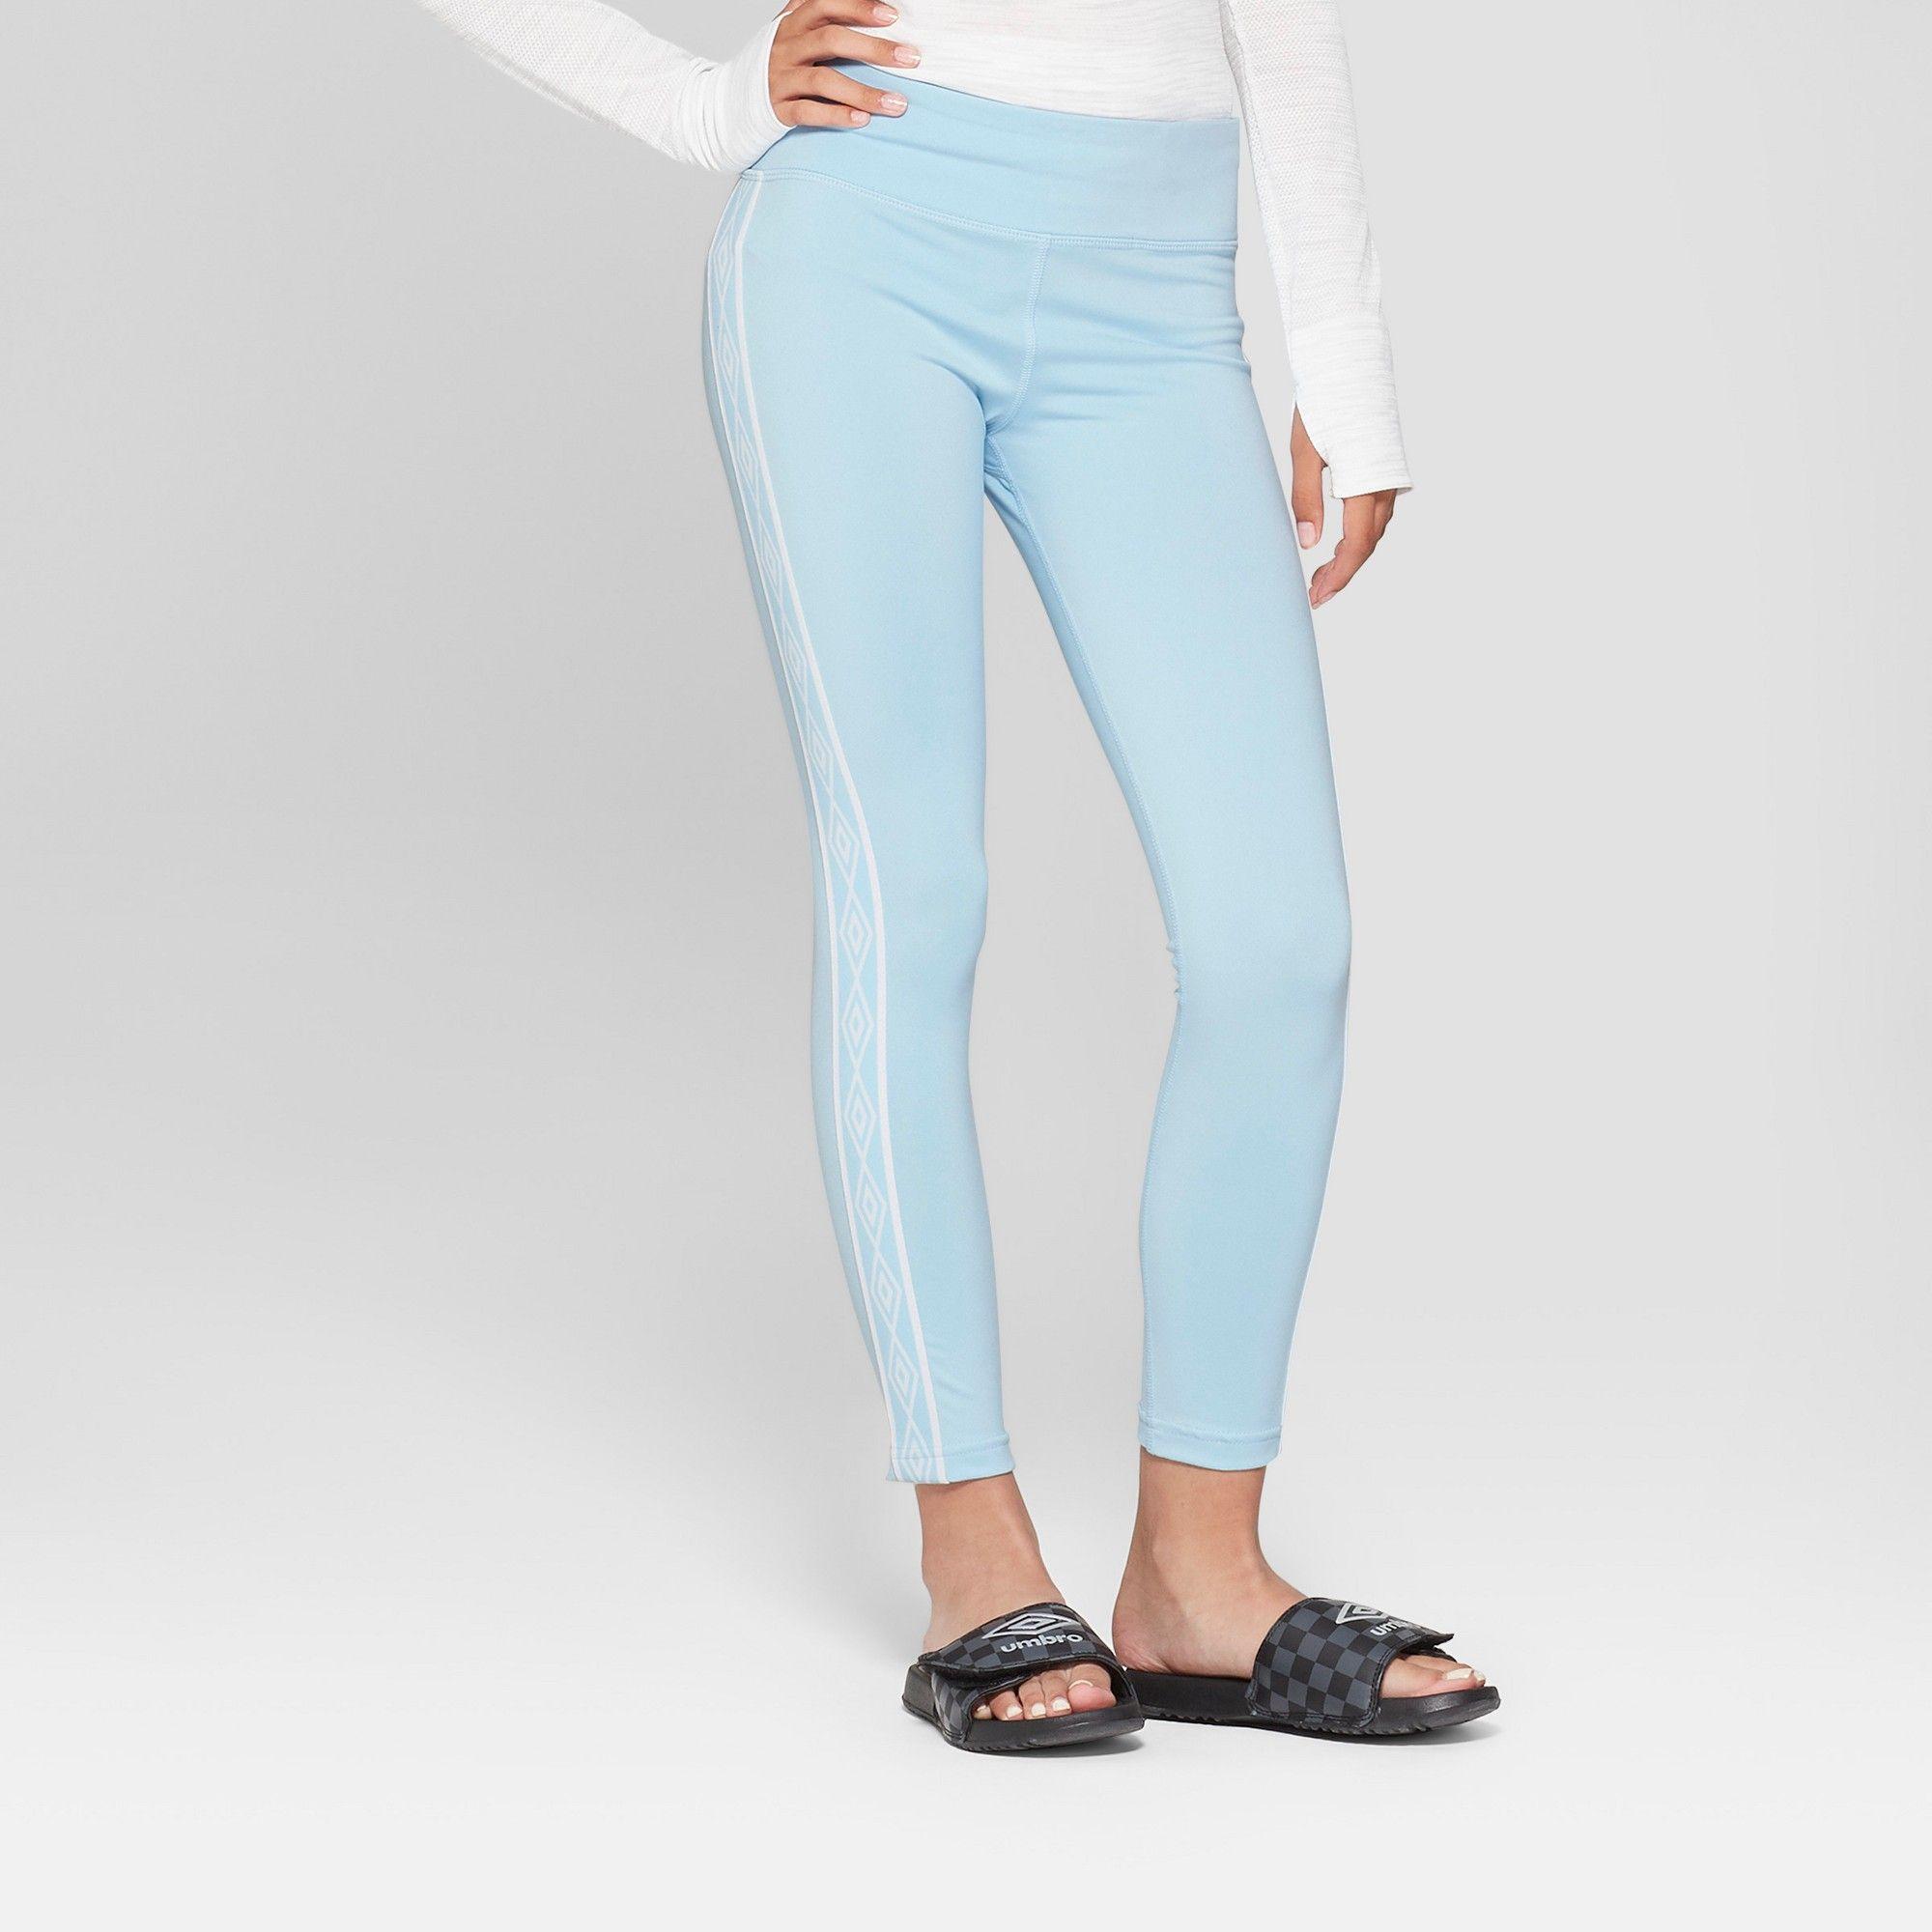 7e095278f3 Umbro Girls' Double Diamond Performance Leggings - Light Airy Blue L, Air  Blue